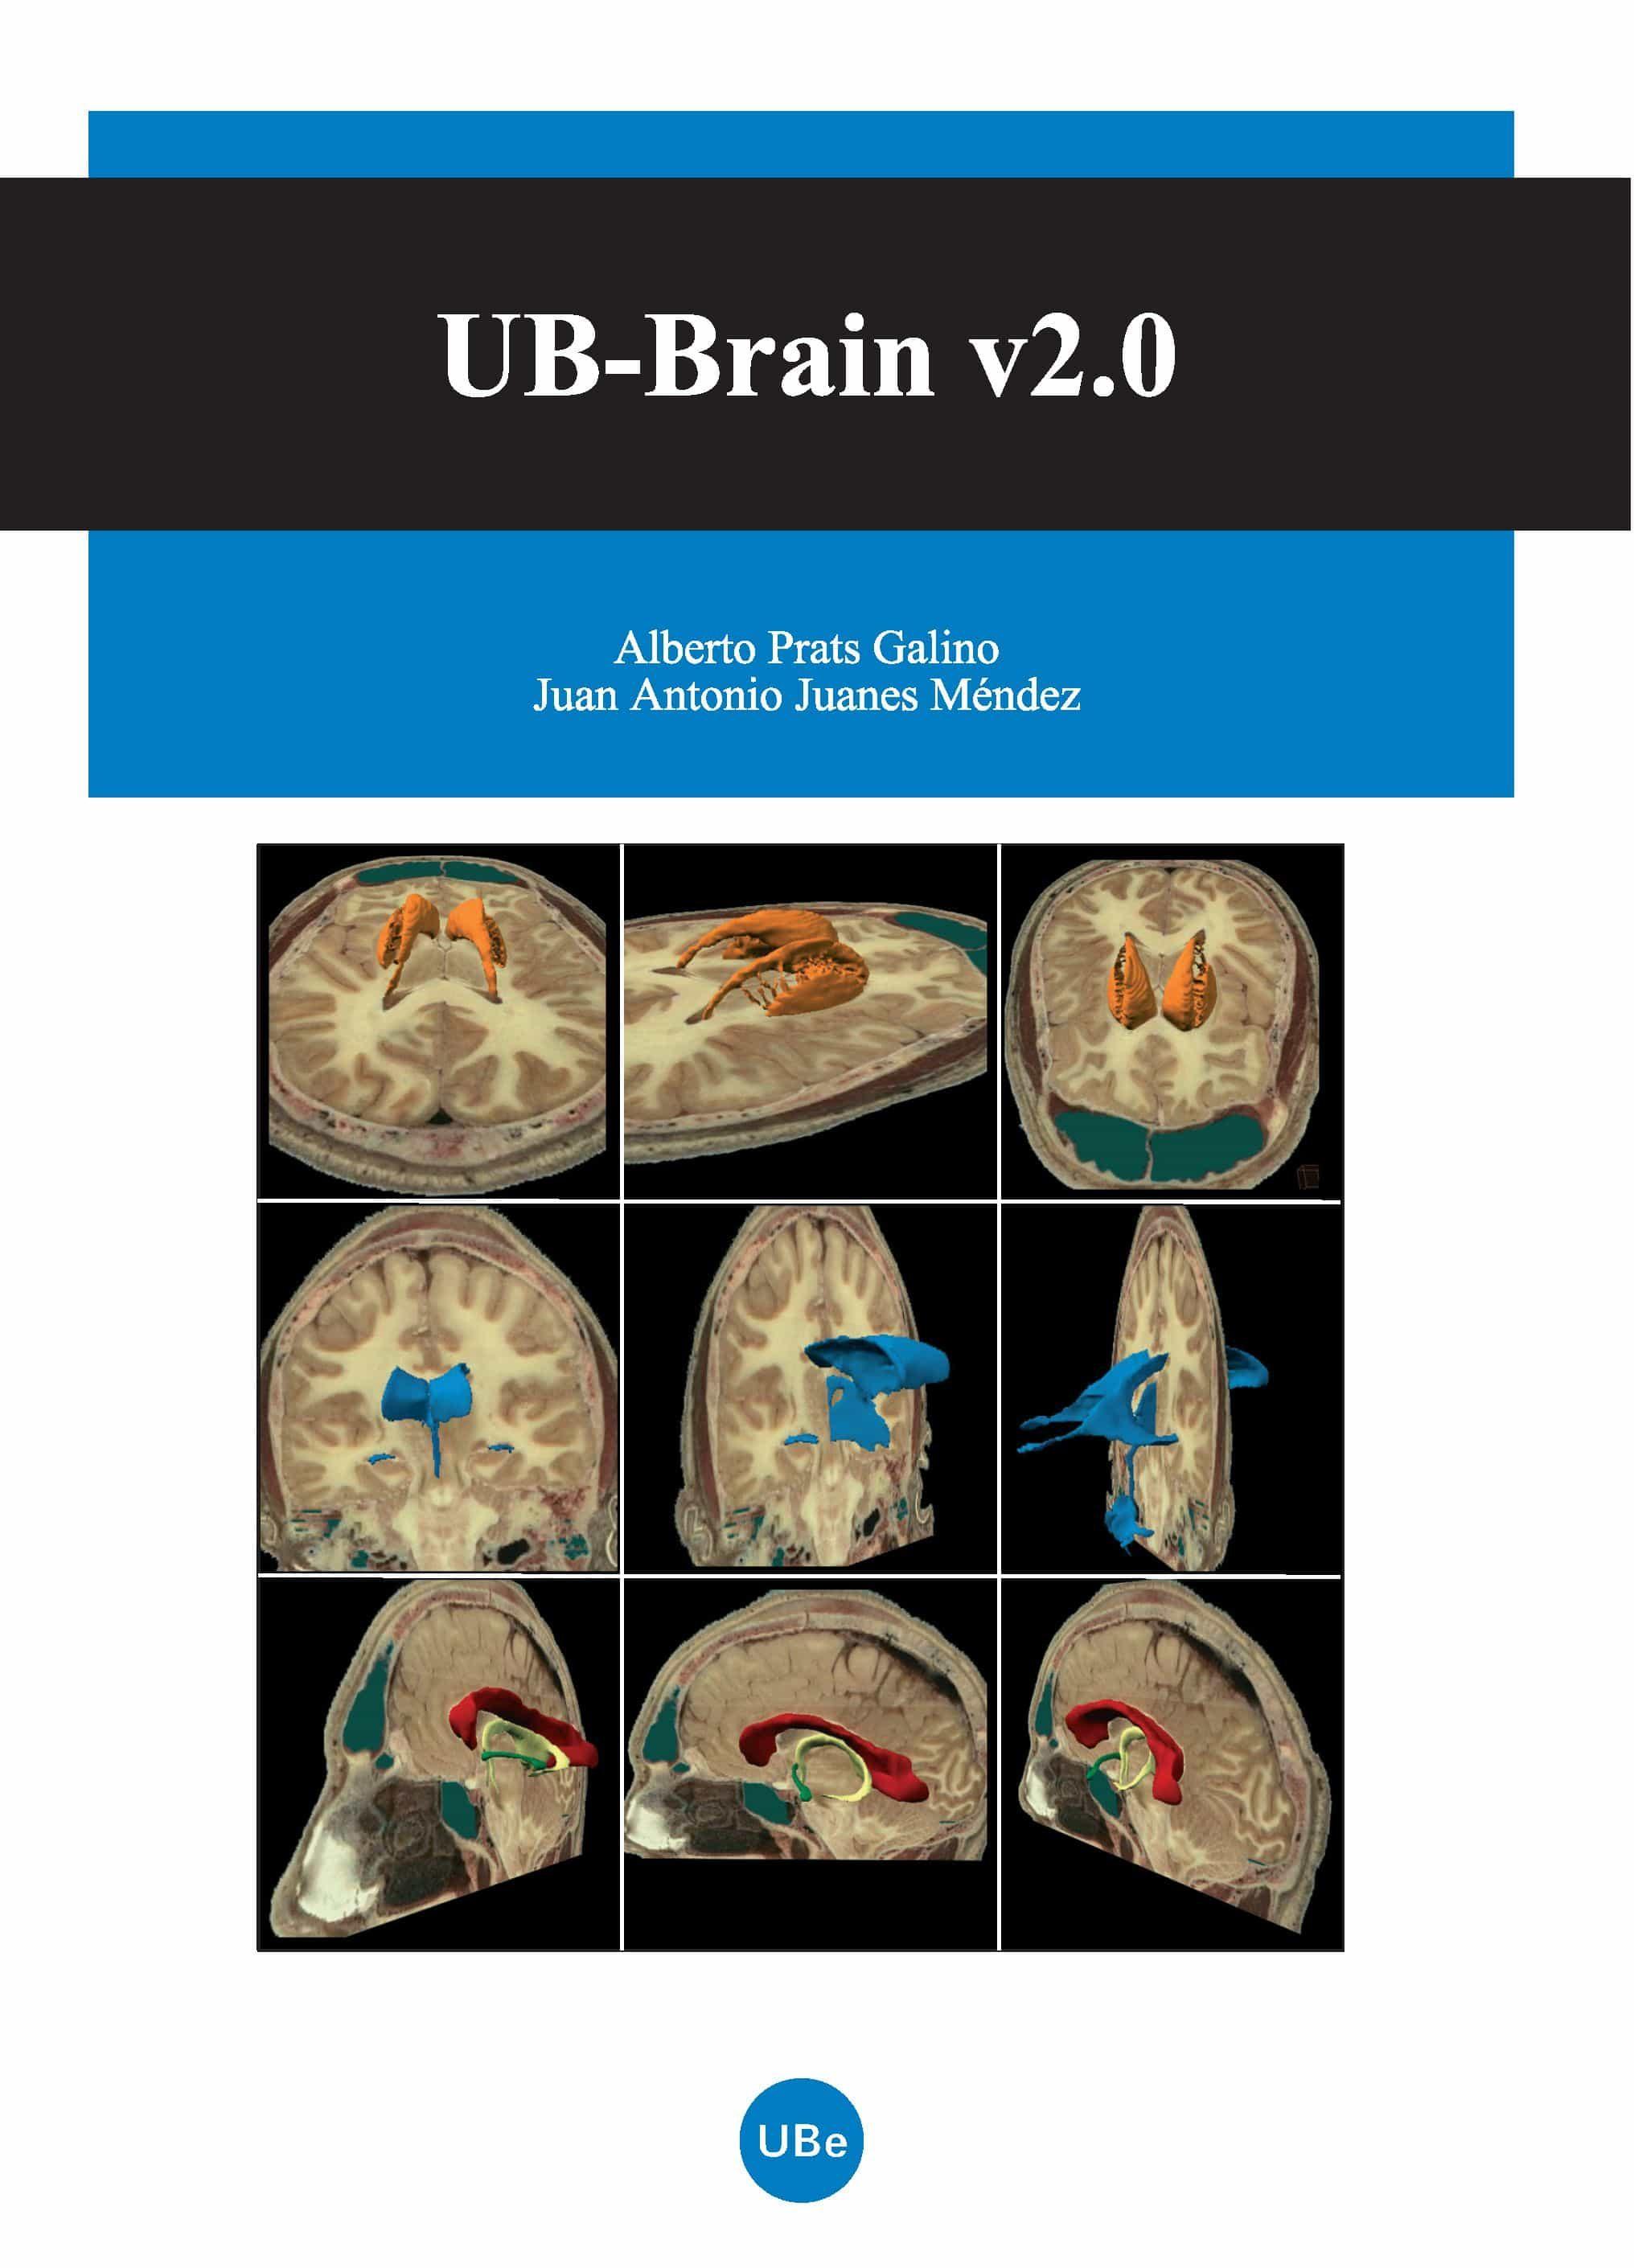 UB-BRAIN V 2.O (CD-ROM) | ALBERTO PRATS | Comprar libro 9788447532155